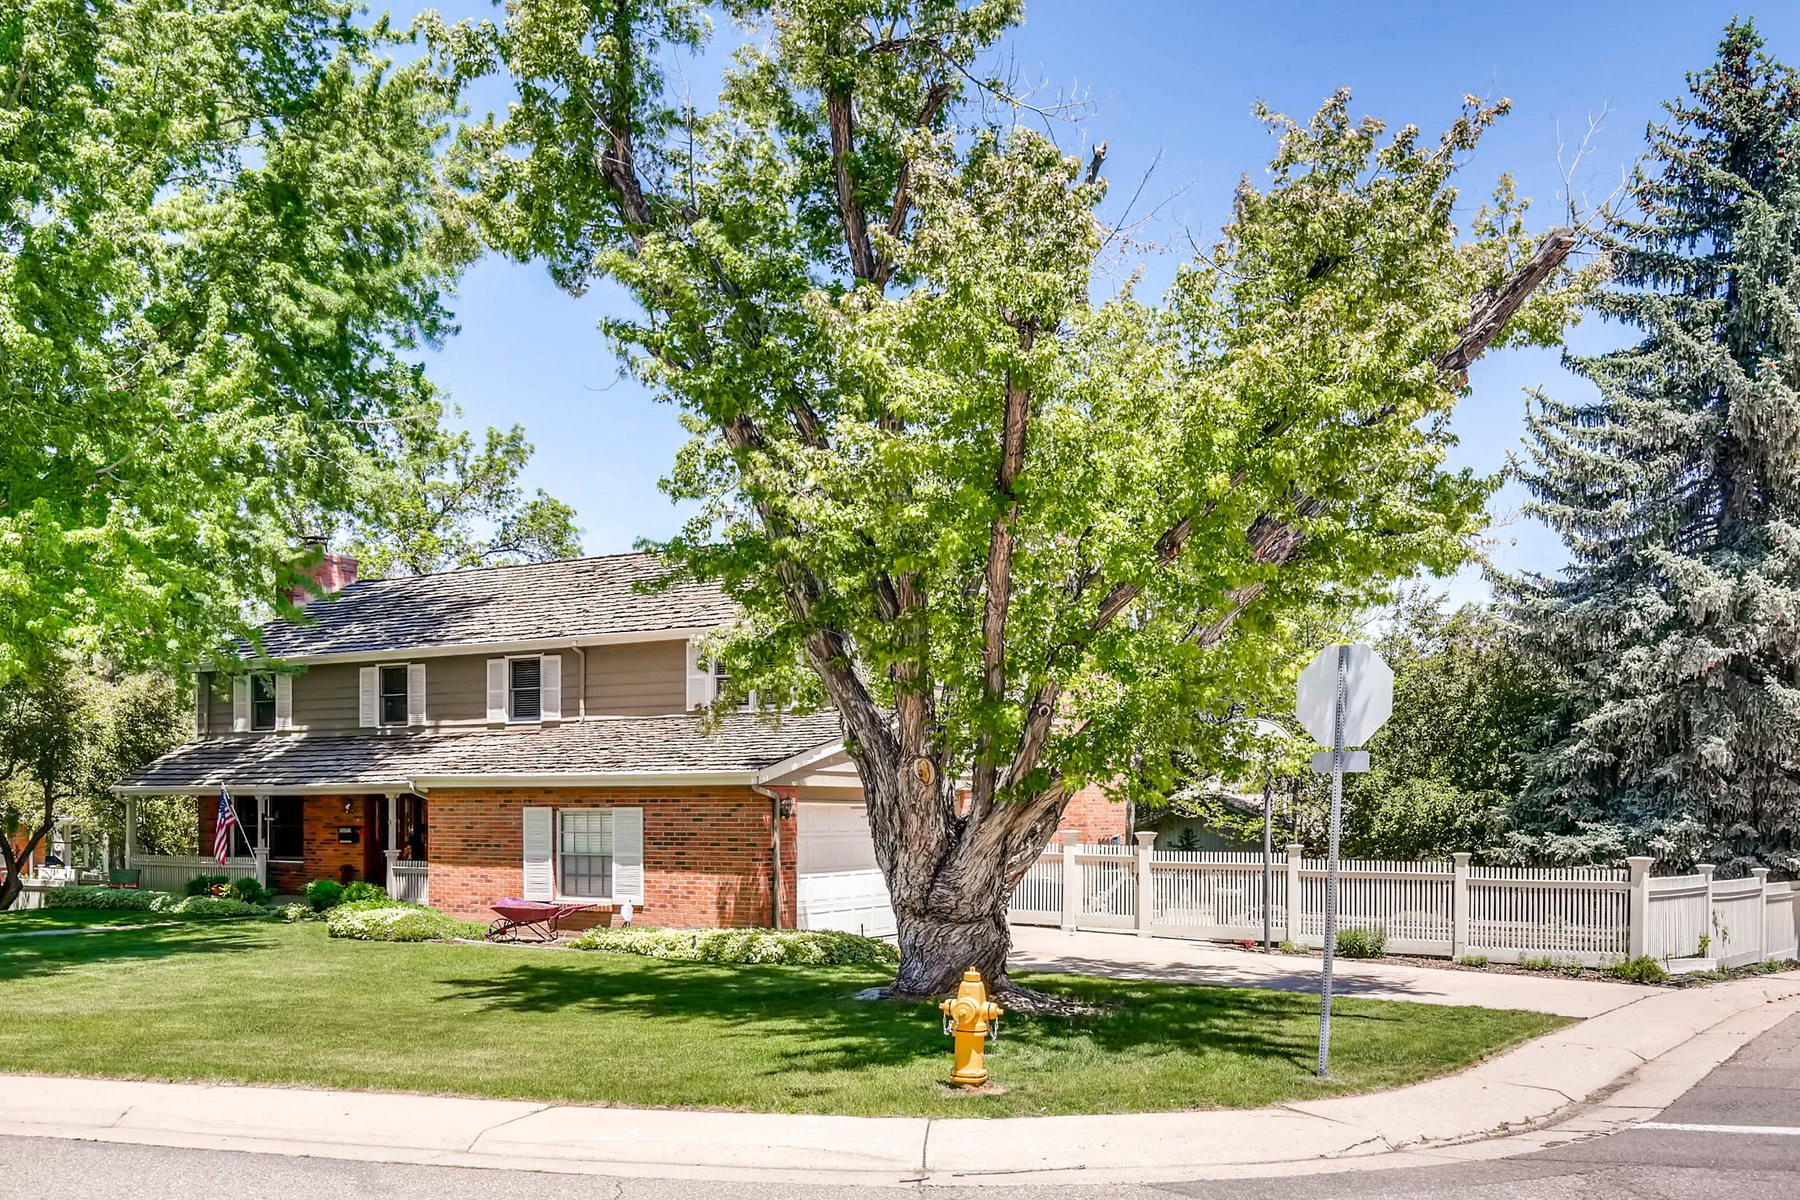 1801 West Briarwood Avenue, Littleton, CO 80120